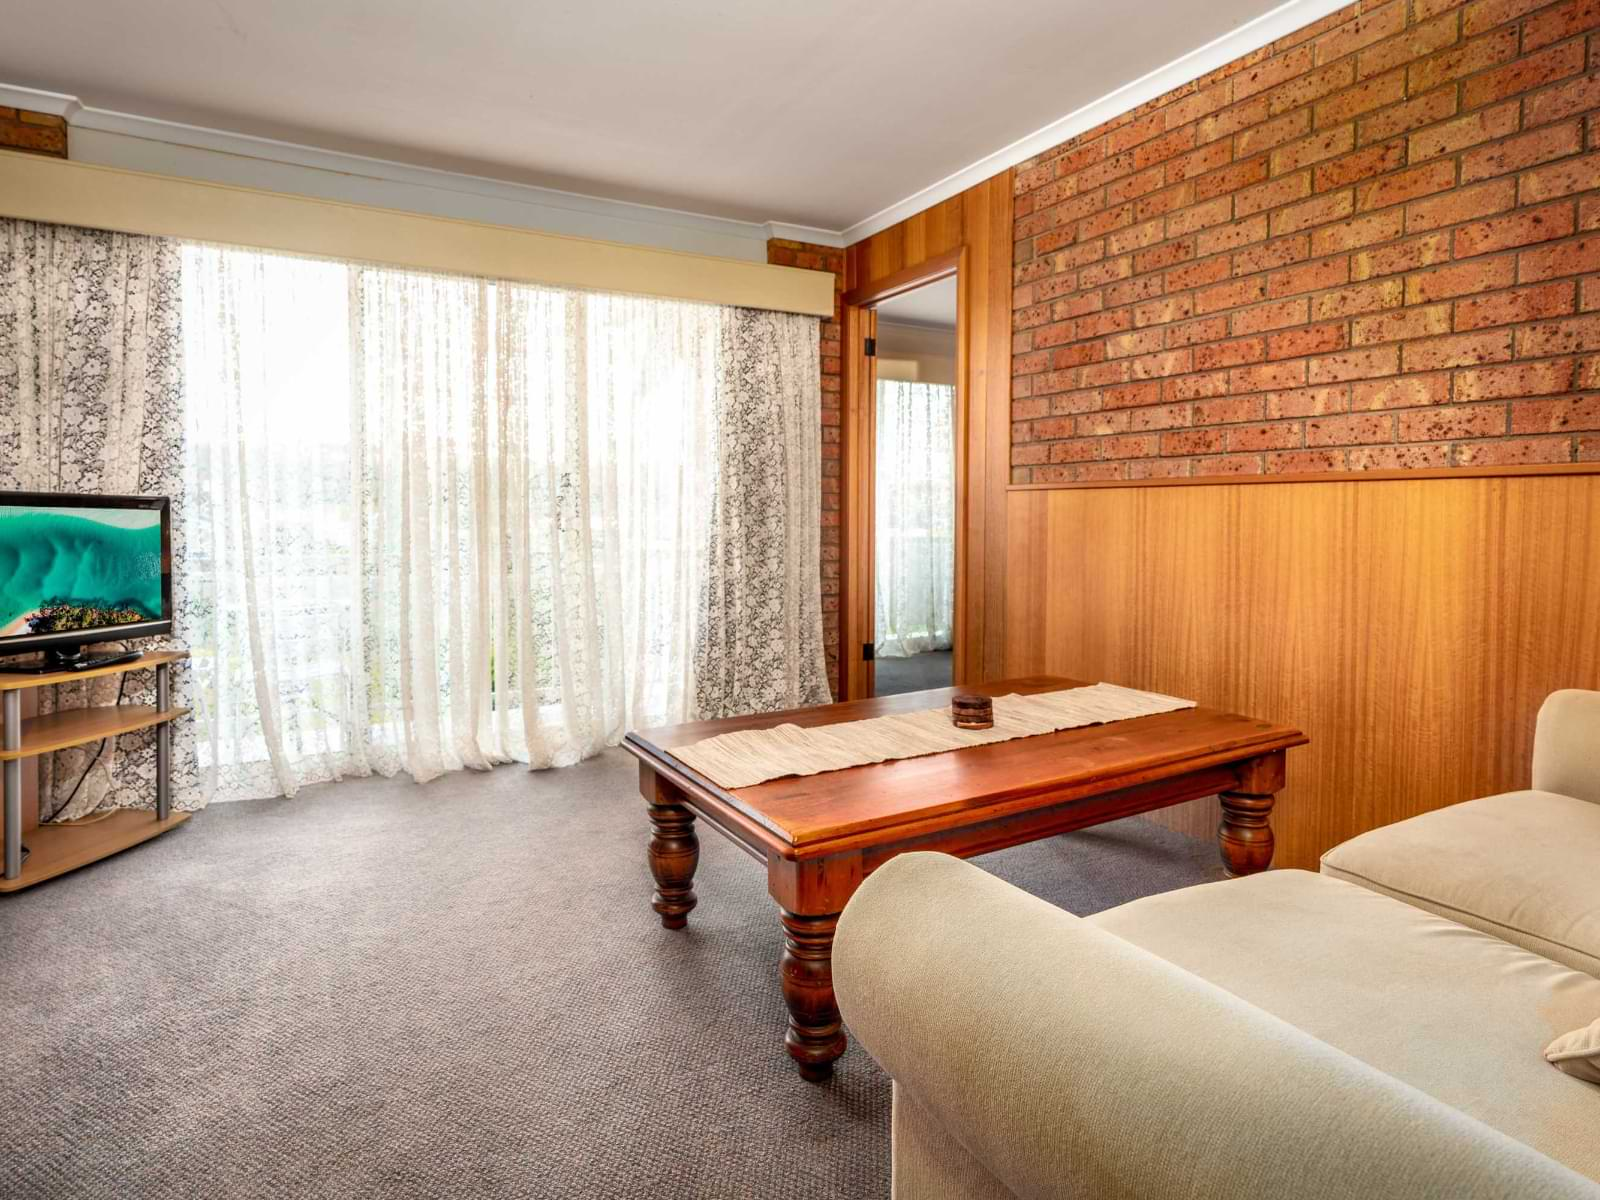 15-Lounge Suite-15 Small Suite-sRGB@2x